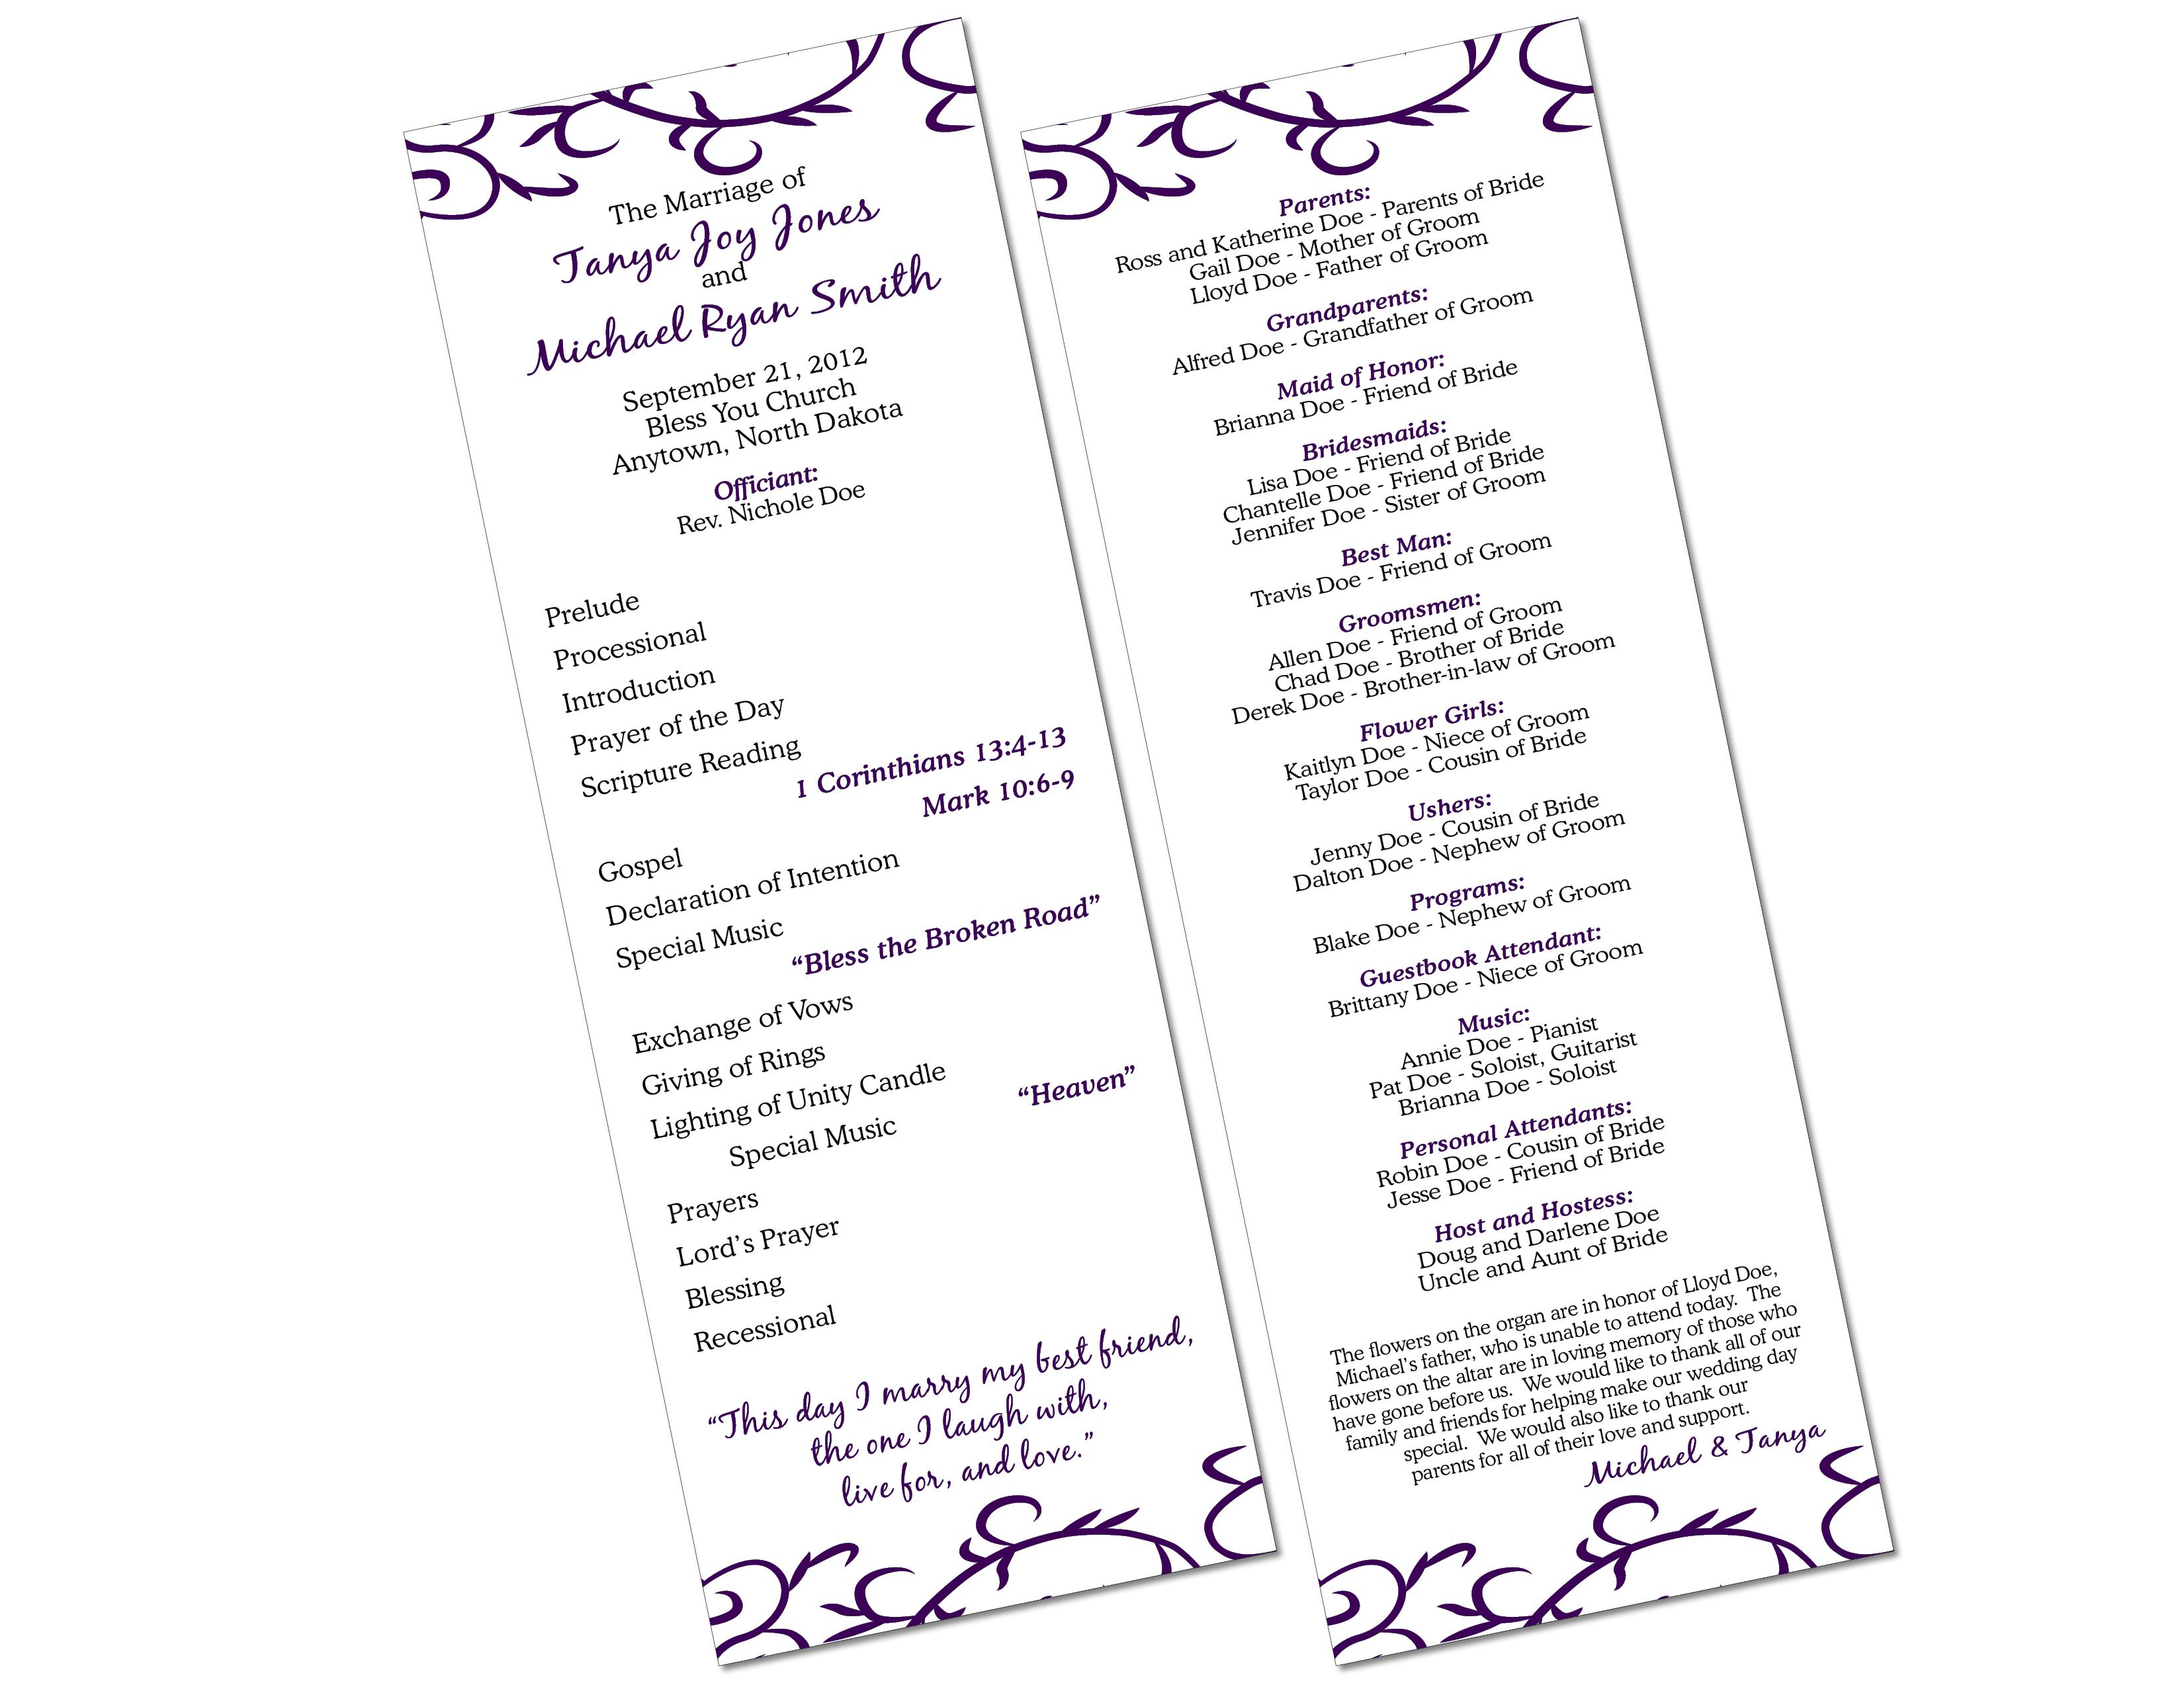 Free Diy Catholic Wedding Program Ai Template I M A Professional Graphic Designer And Catholic Wedding Program Diy Wedding Programs Wedding Programs Template